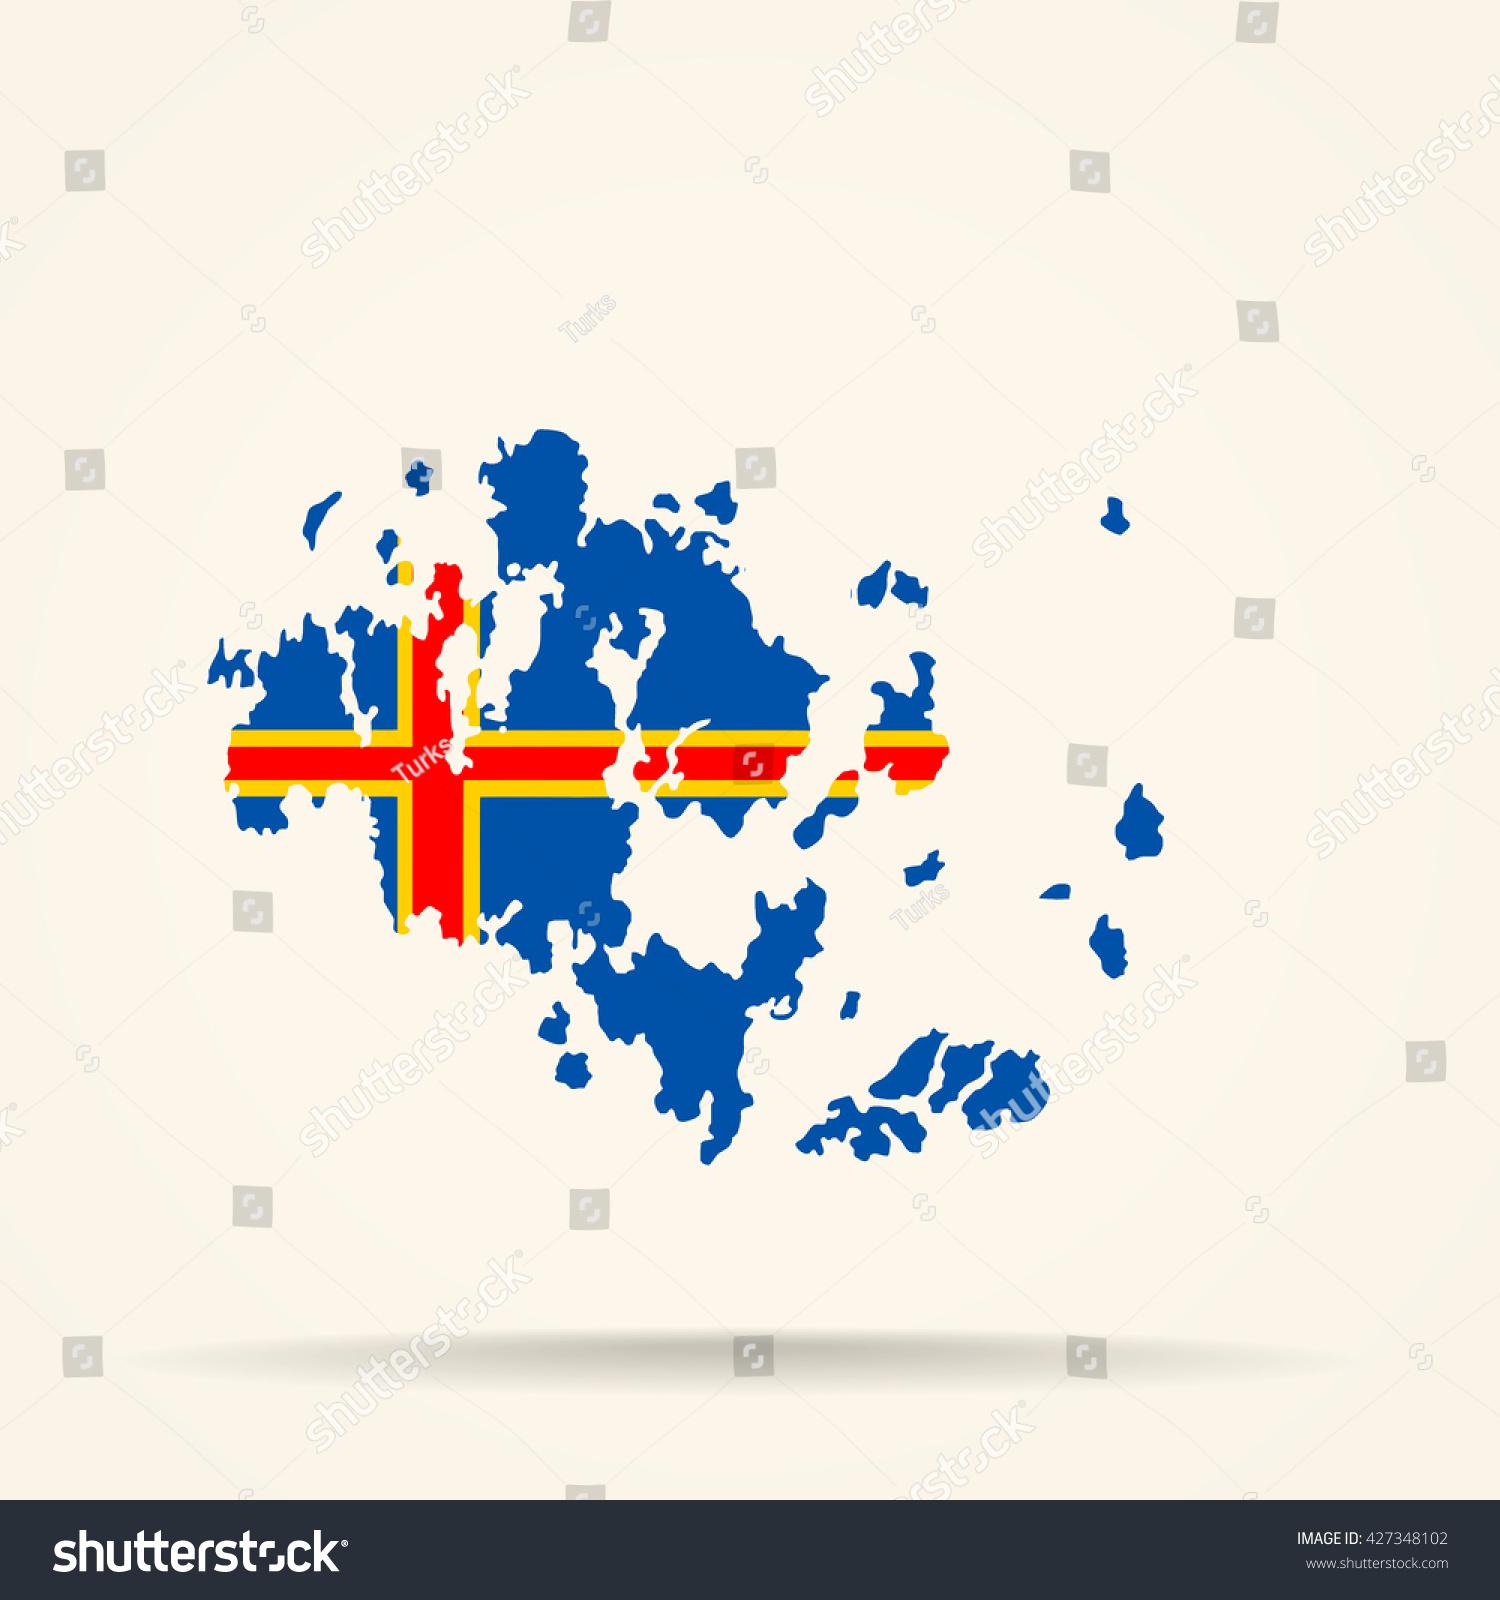 Map Aland Islands Aland Islands Flag Stock Vector - Aland islands world map